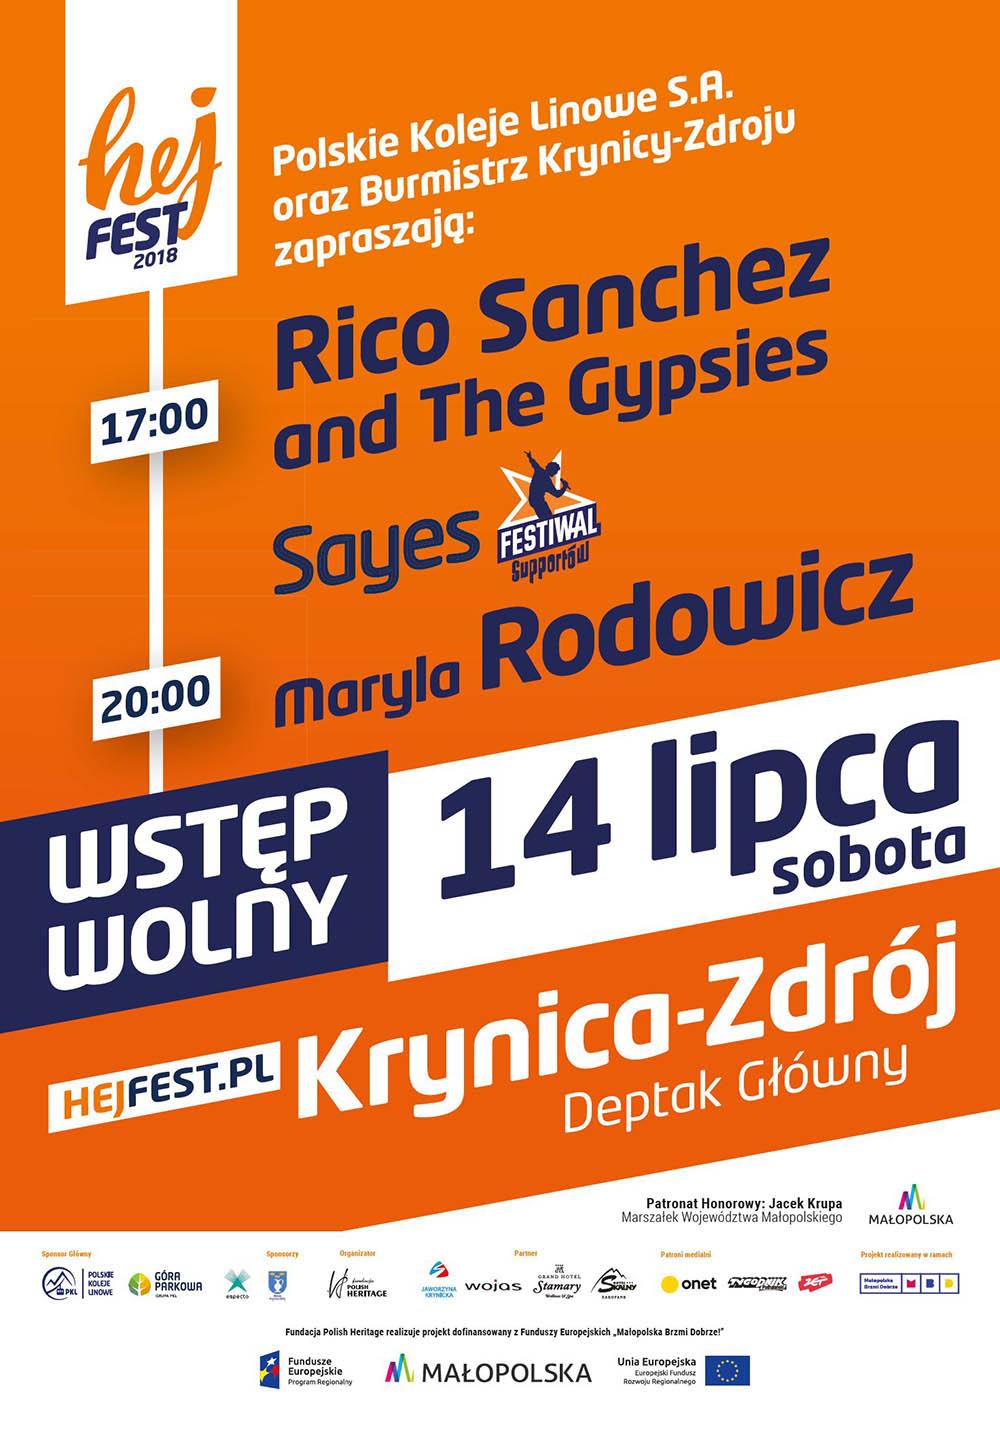 Hej Fest 2018 w Krynicy-Zdroju - 14 lipca 2018 - plakat